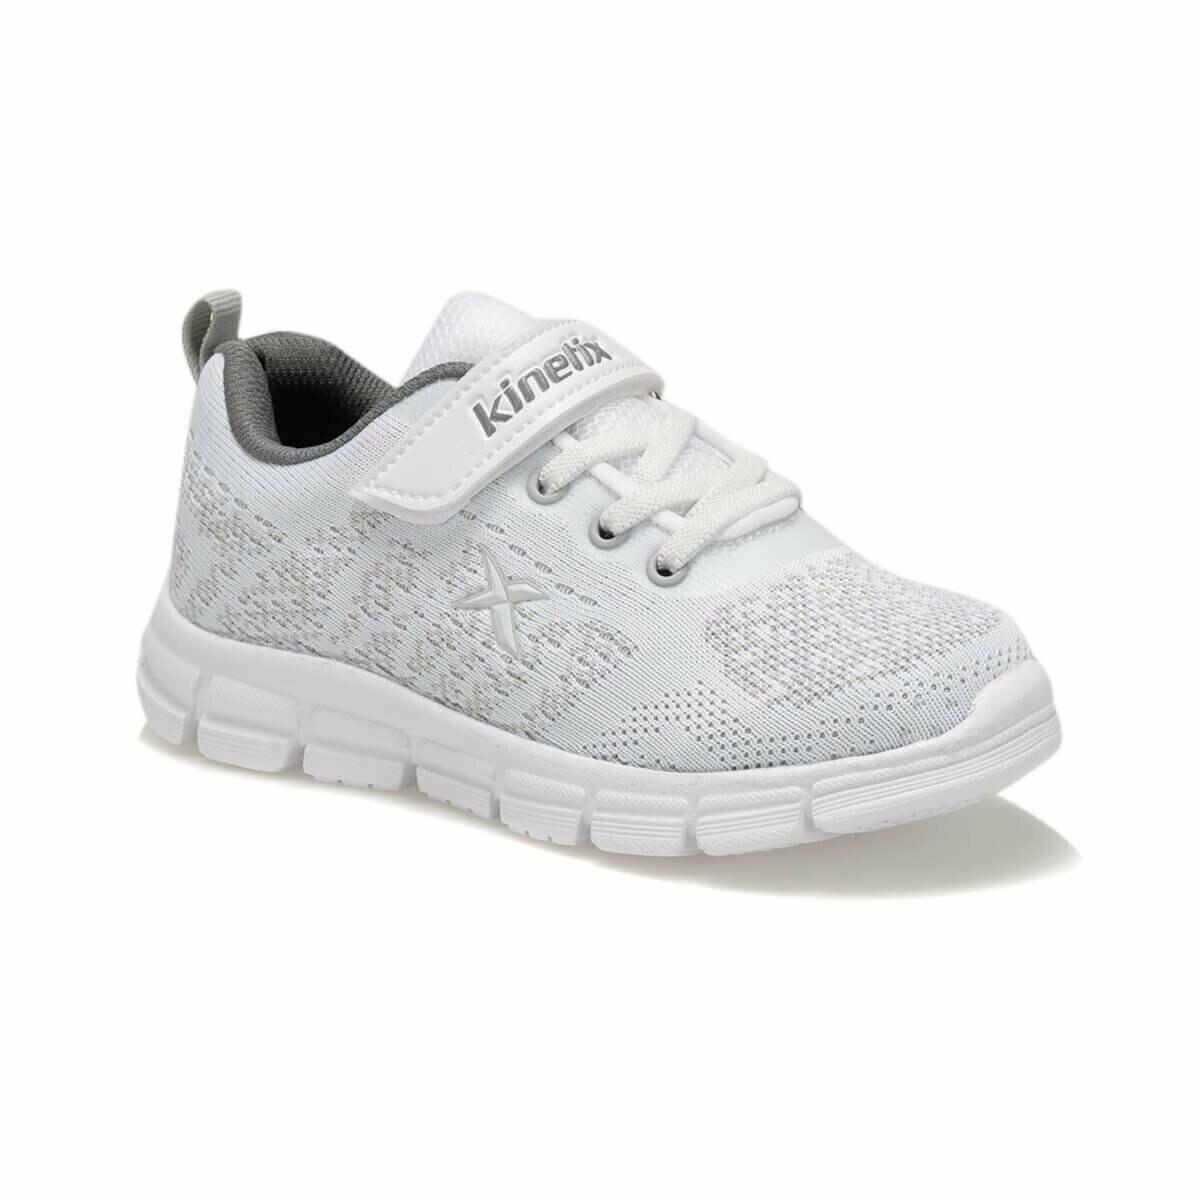 FLO ROXIE White Male Child Running Shoes KINETIX